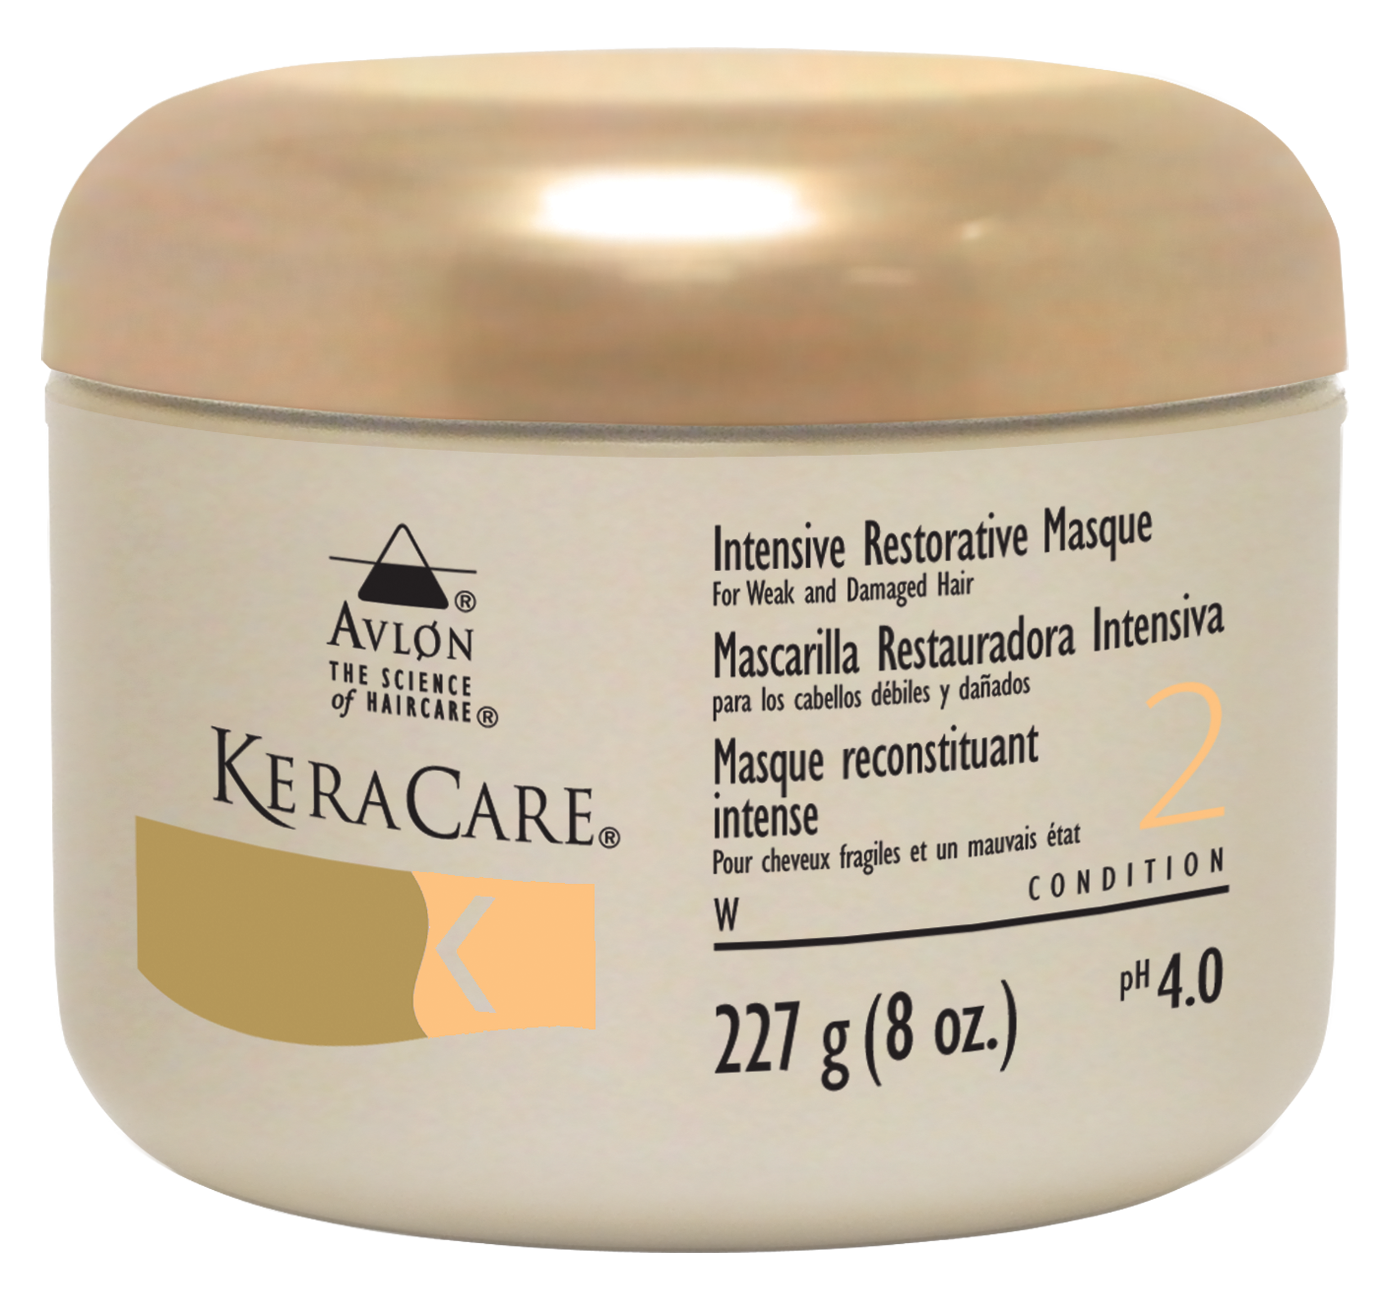 KeraCare® Intensive Restorative Masque